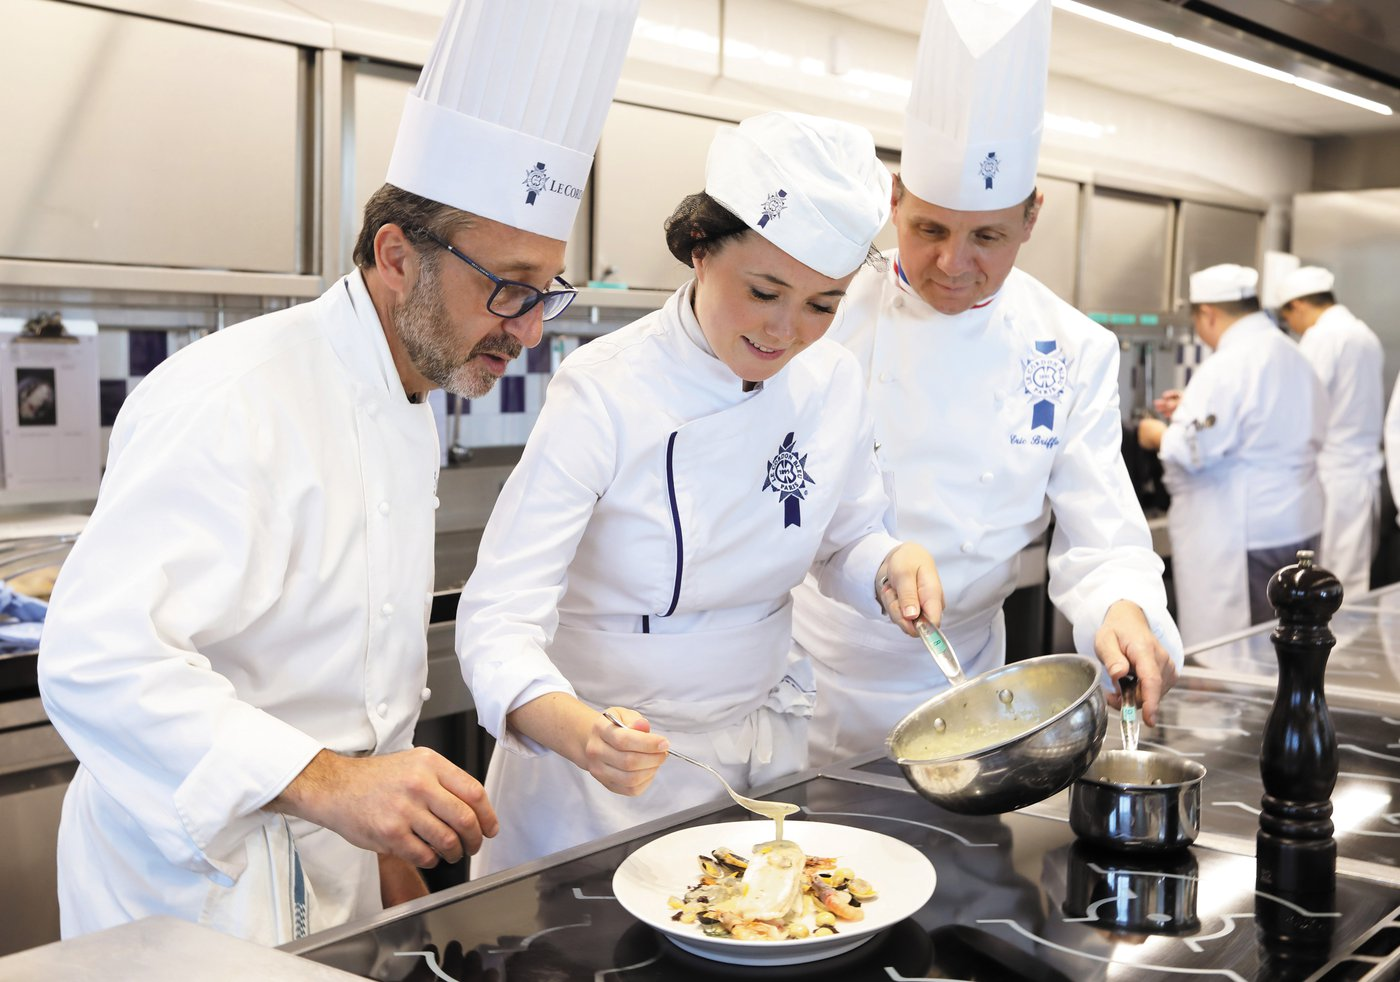 Le-Cordon-Bleu-Paris-Practical-Cuisine-Chef-Caussimon-Chef-Briffard-and-Student.jpg